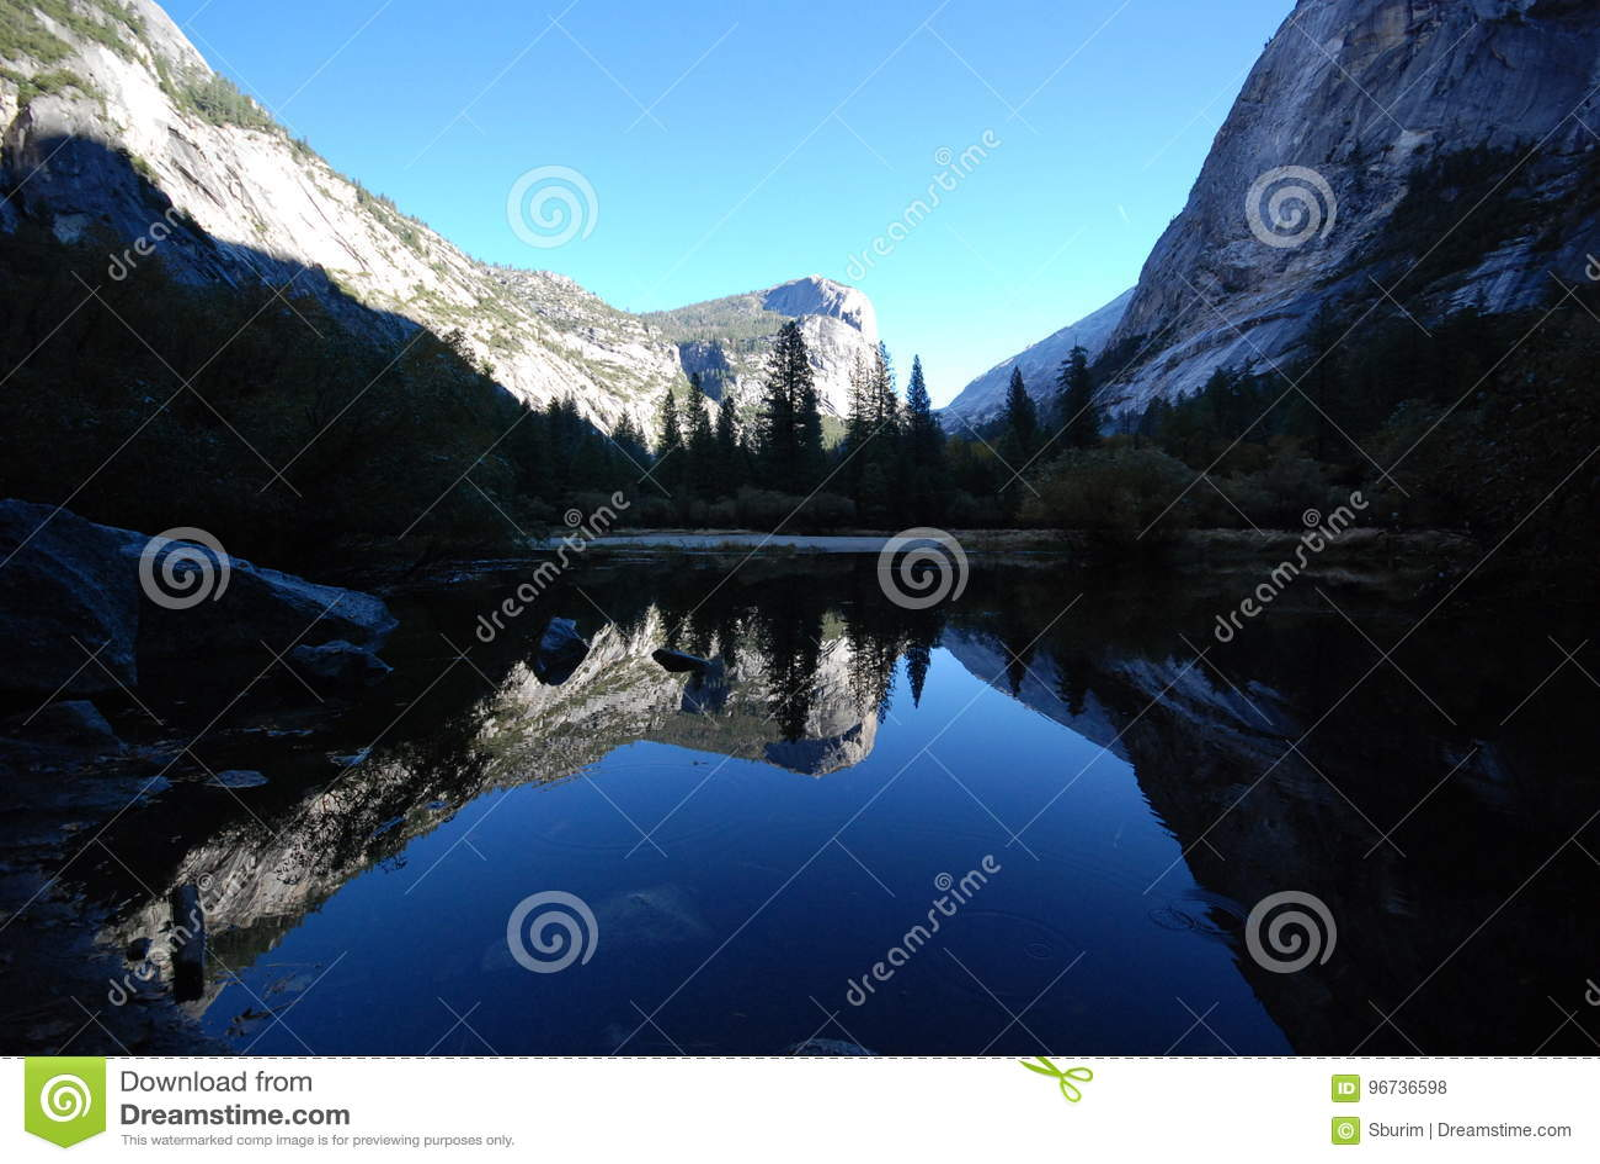 Spegel lake